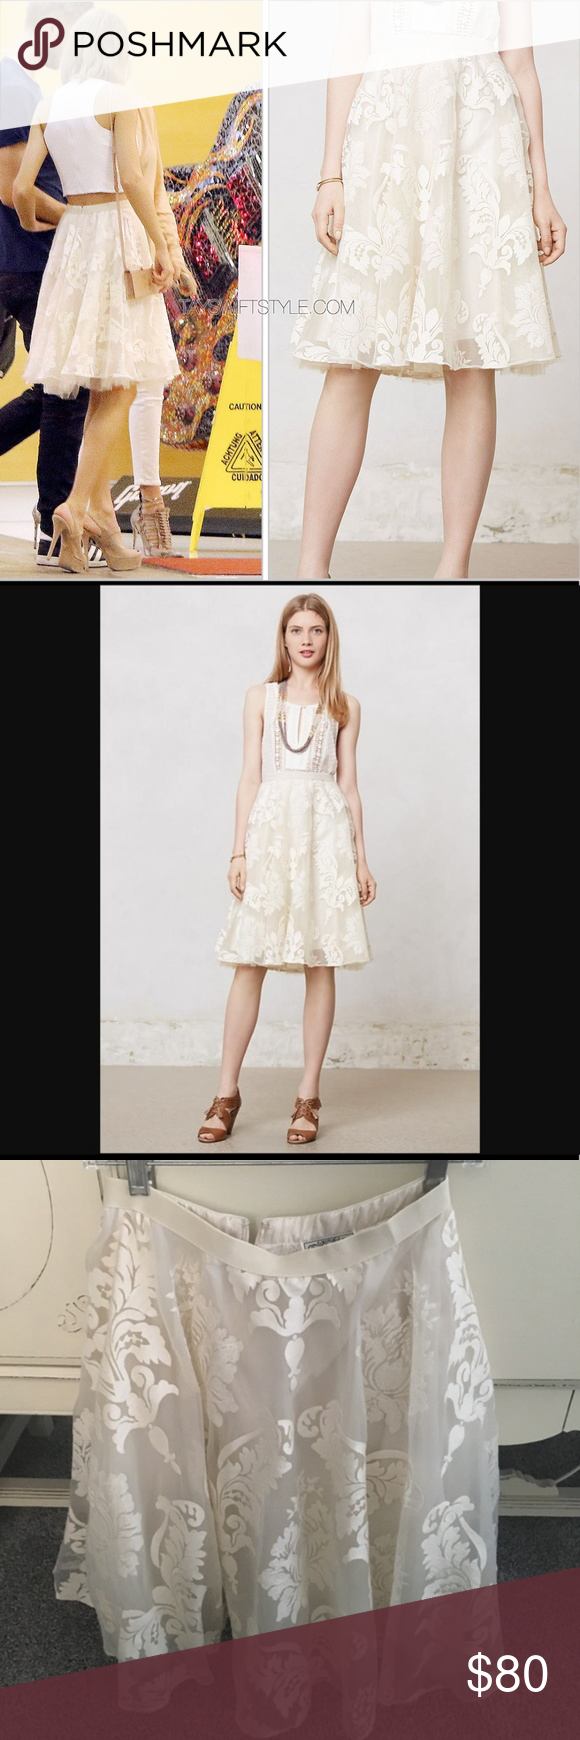 f2526b96851fe Anthropologie Emeline Tulle Skirt ASO Taylor Swift Gorgeous NWOT Emeline  Tulle Skirt by Anthropologie / Yoana Baraschi. Size 0. As worn by Taylor  Swift.